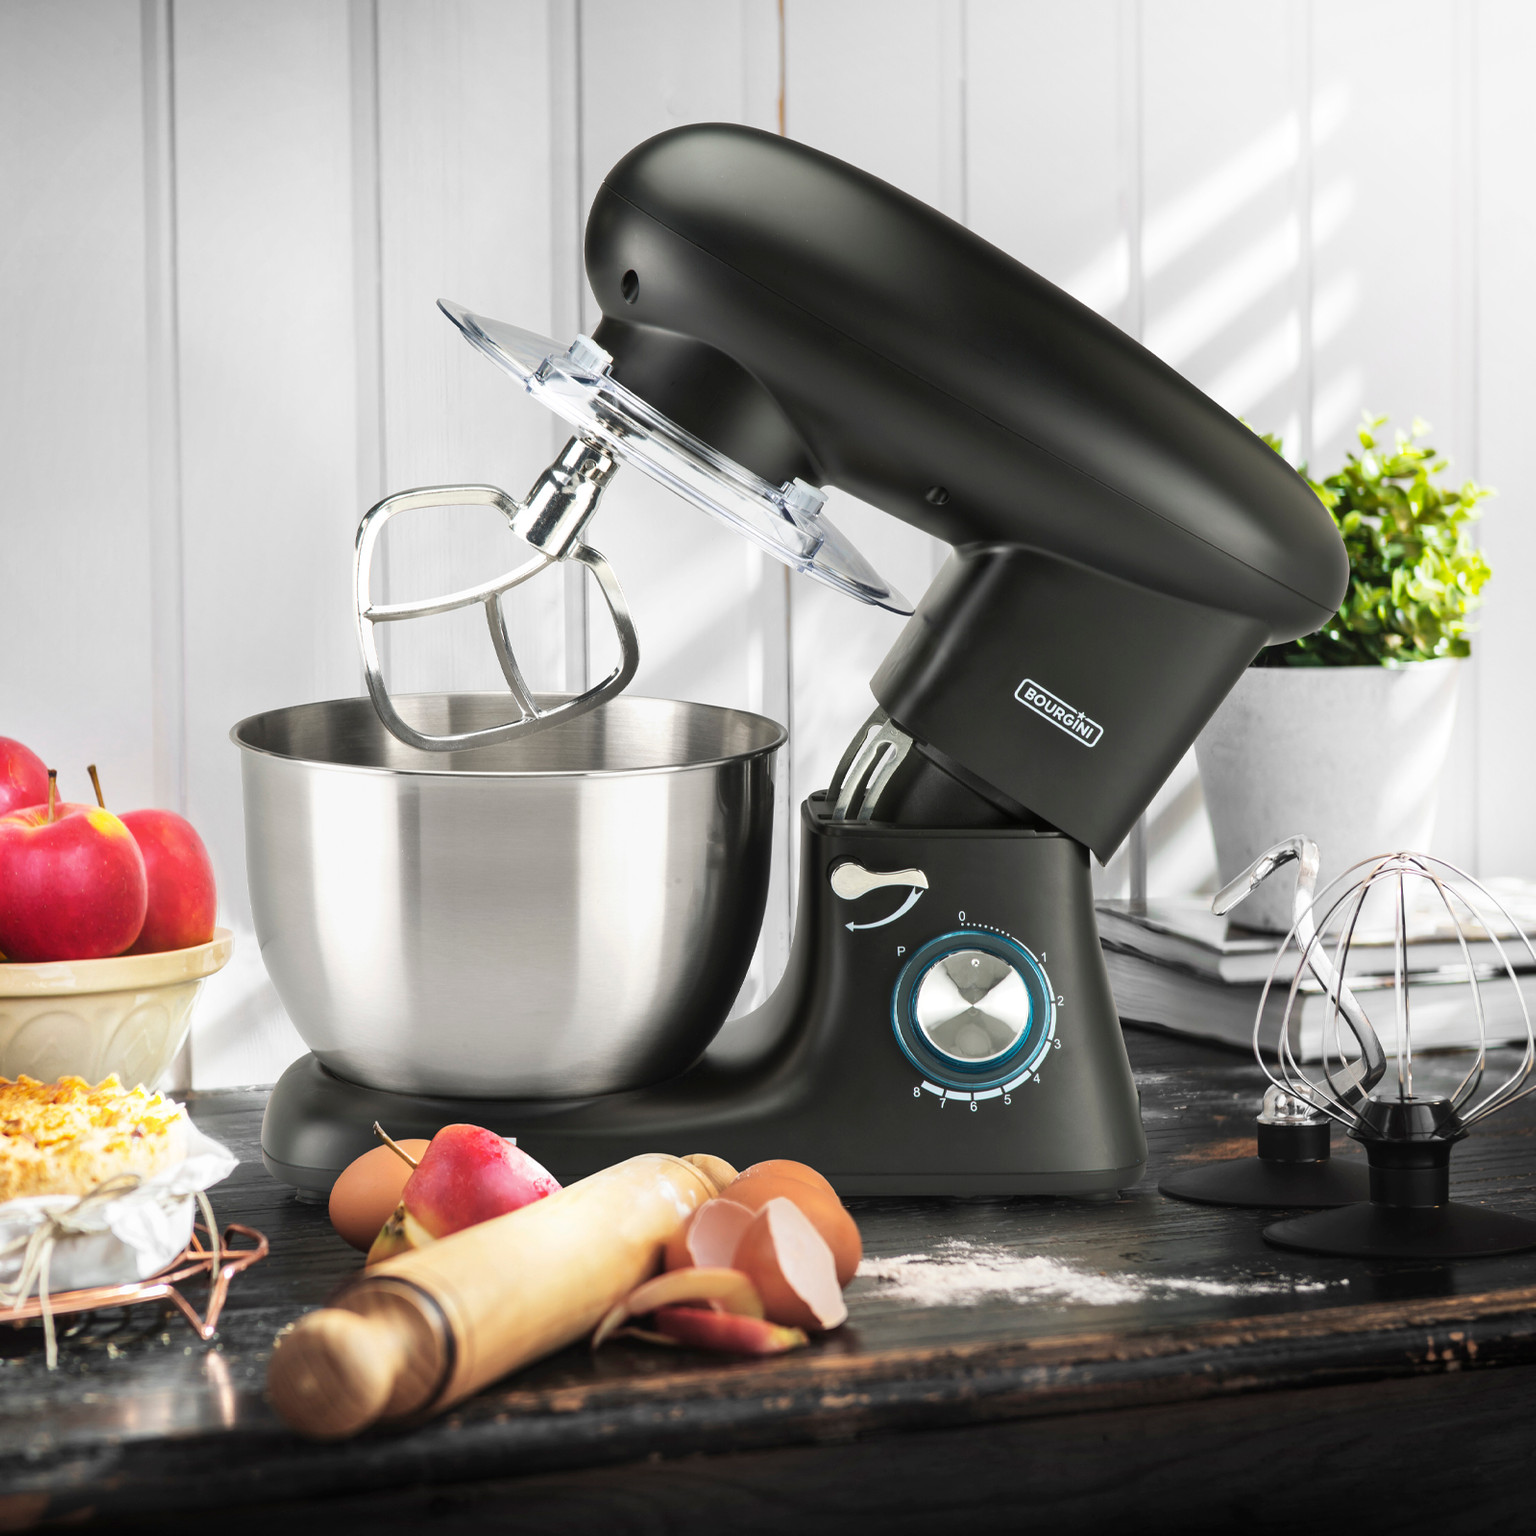 Bourgini keukenmachine aanbieding